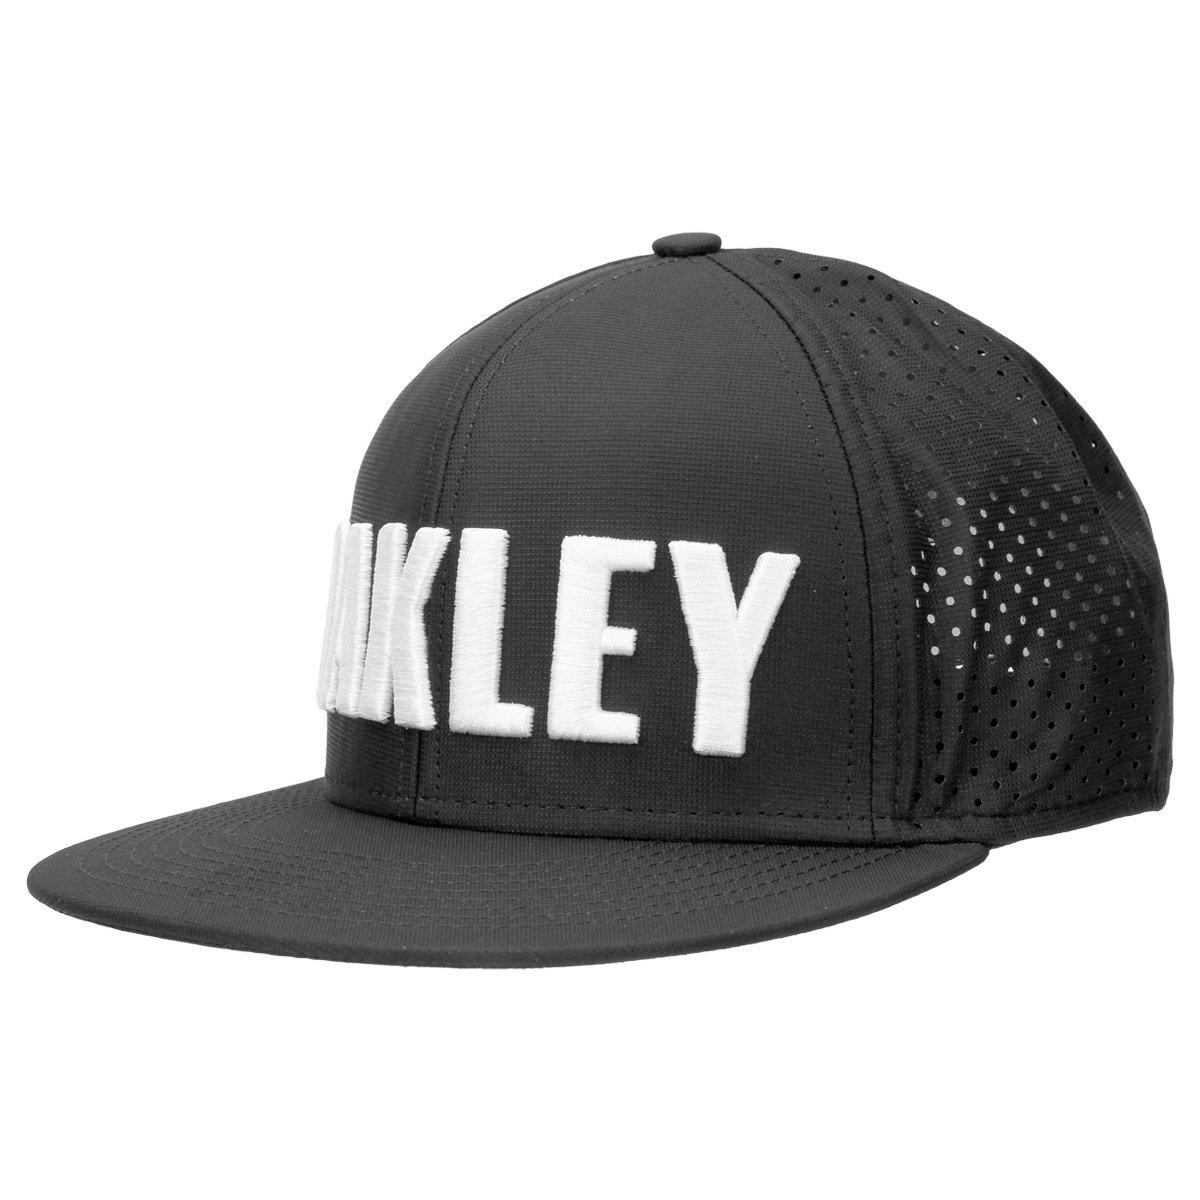 Boné Oakley Aba Reta Mod Perf Hat Masculino - Compre Agora  94ca6c96888